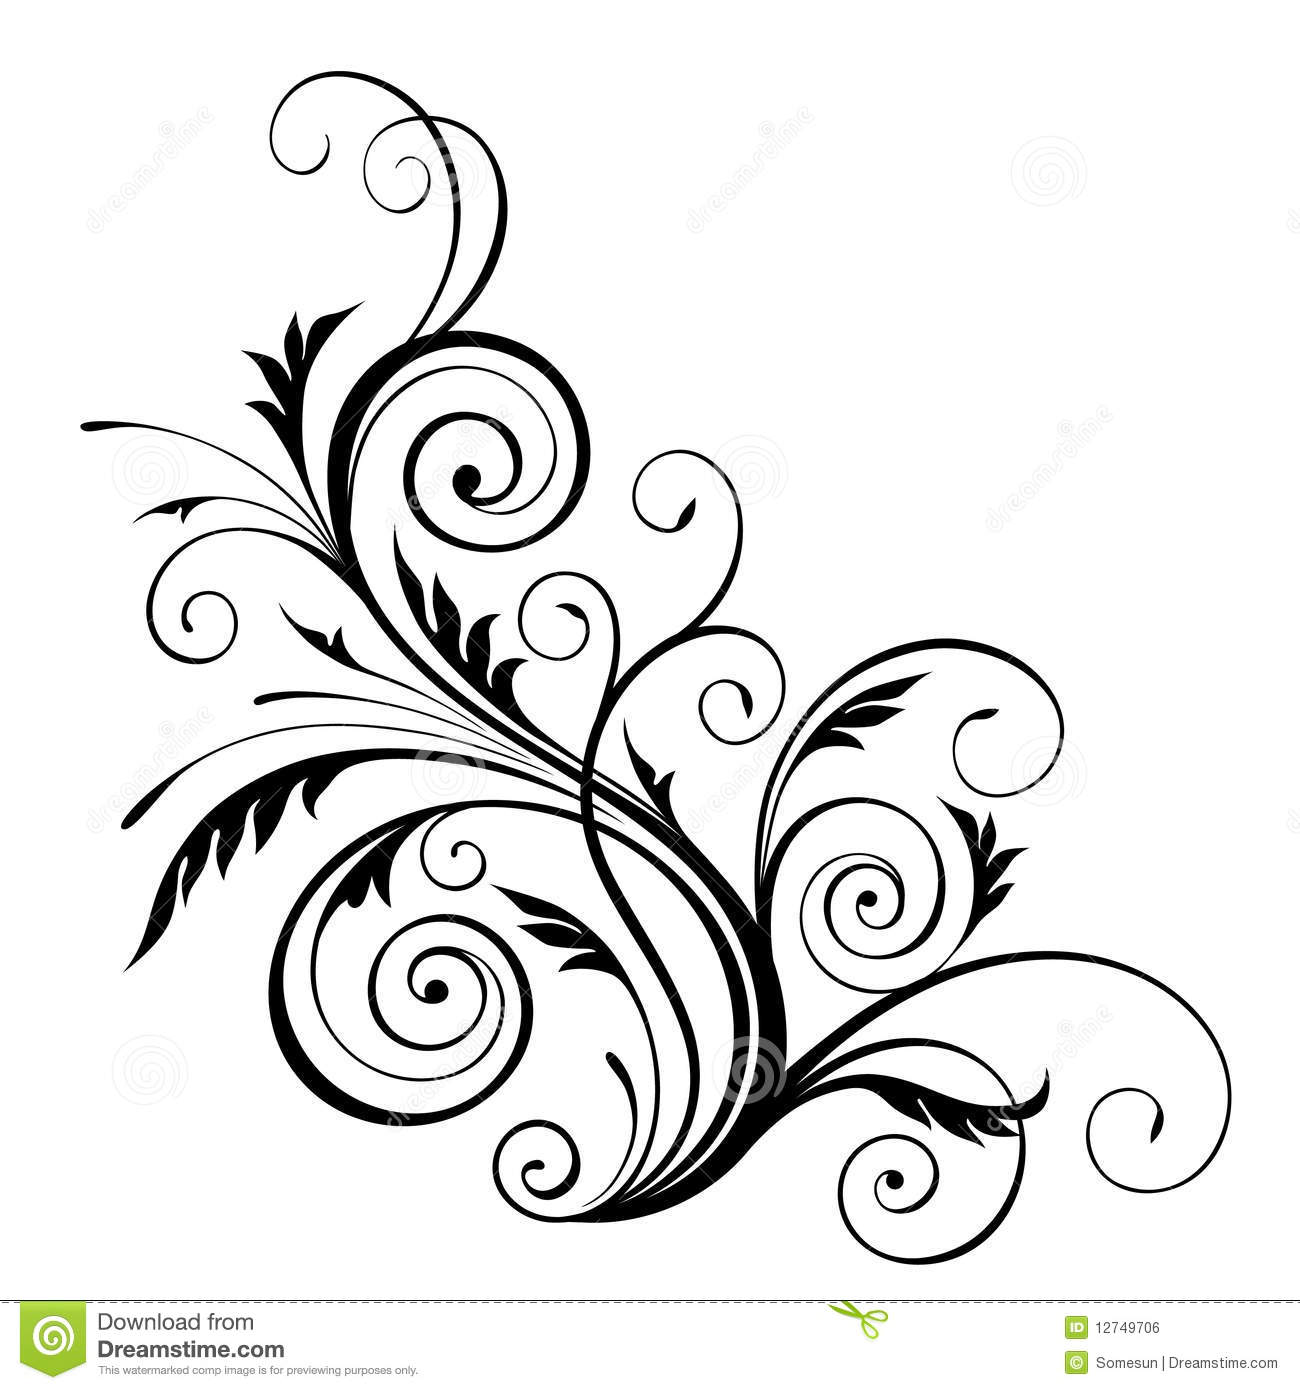 simple swirl vector - HD1200×1200